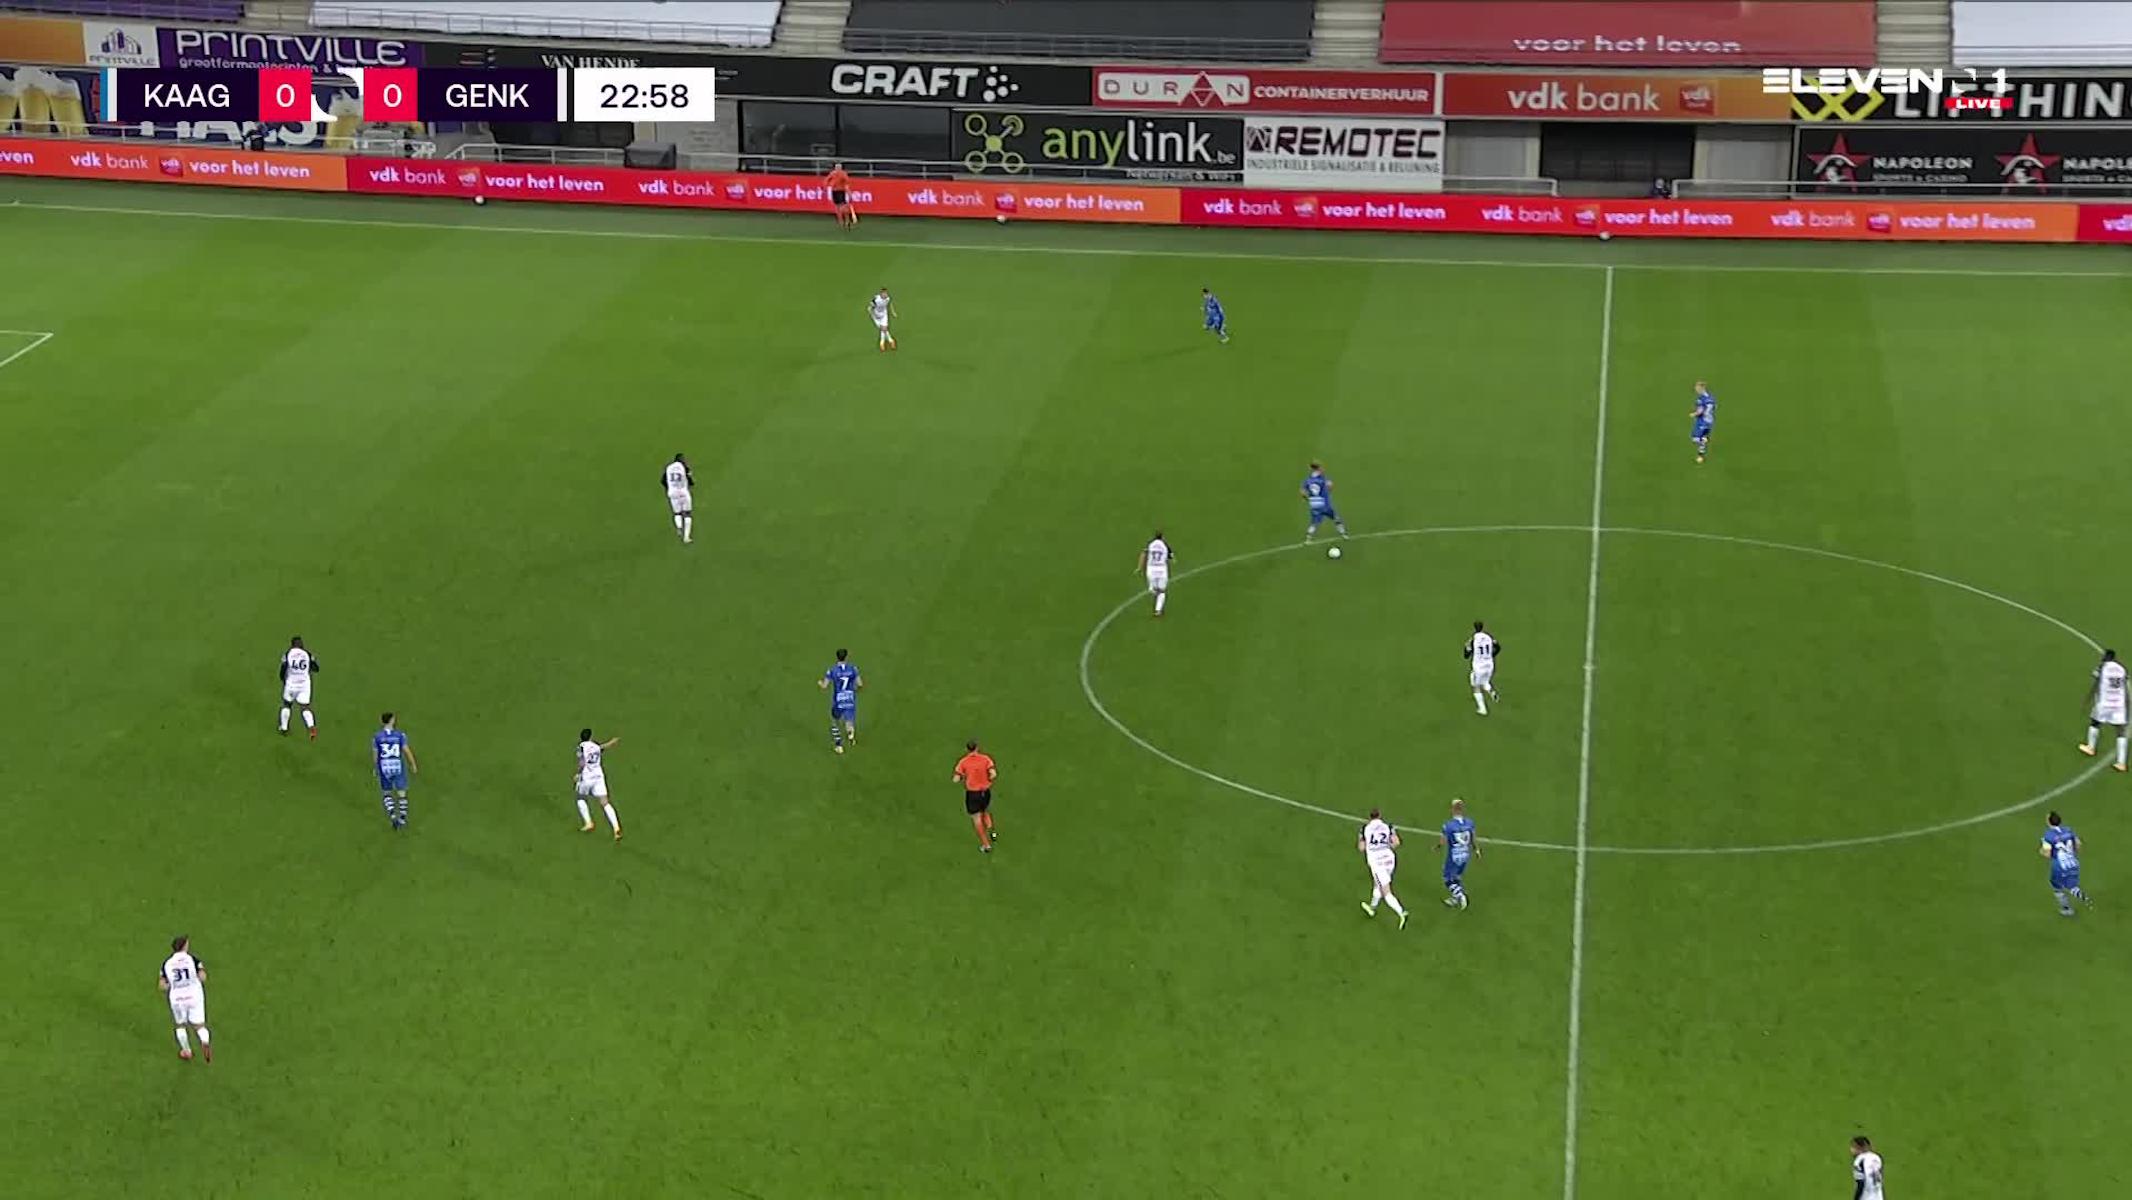 Doelpunt Alessio Castro-Montes (KAA Gent vs. KRC Genk)